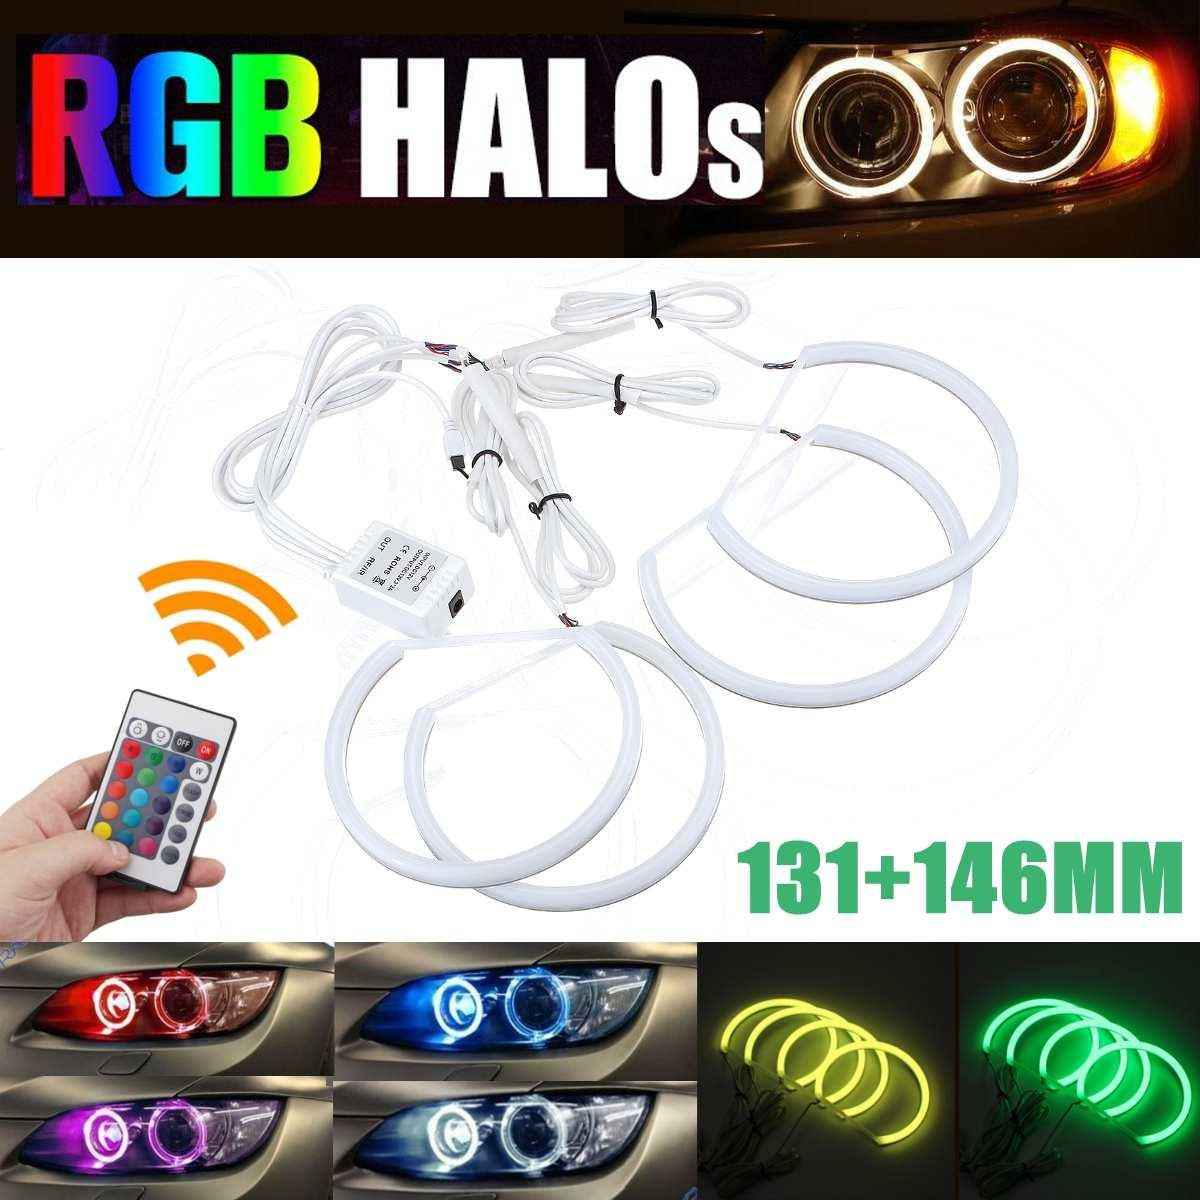 Ángel RGB ojos control remoto 2*131mm 2*146mm algodón anillo halo kit para BMW E46 A + B sin proyector 4D 16 colores flash